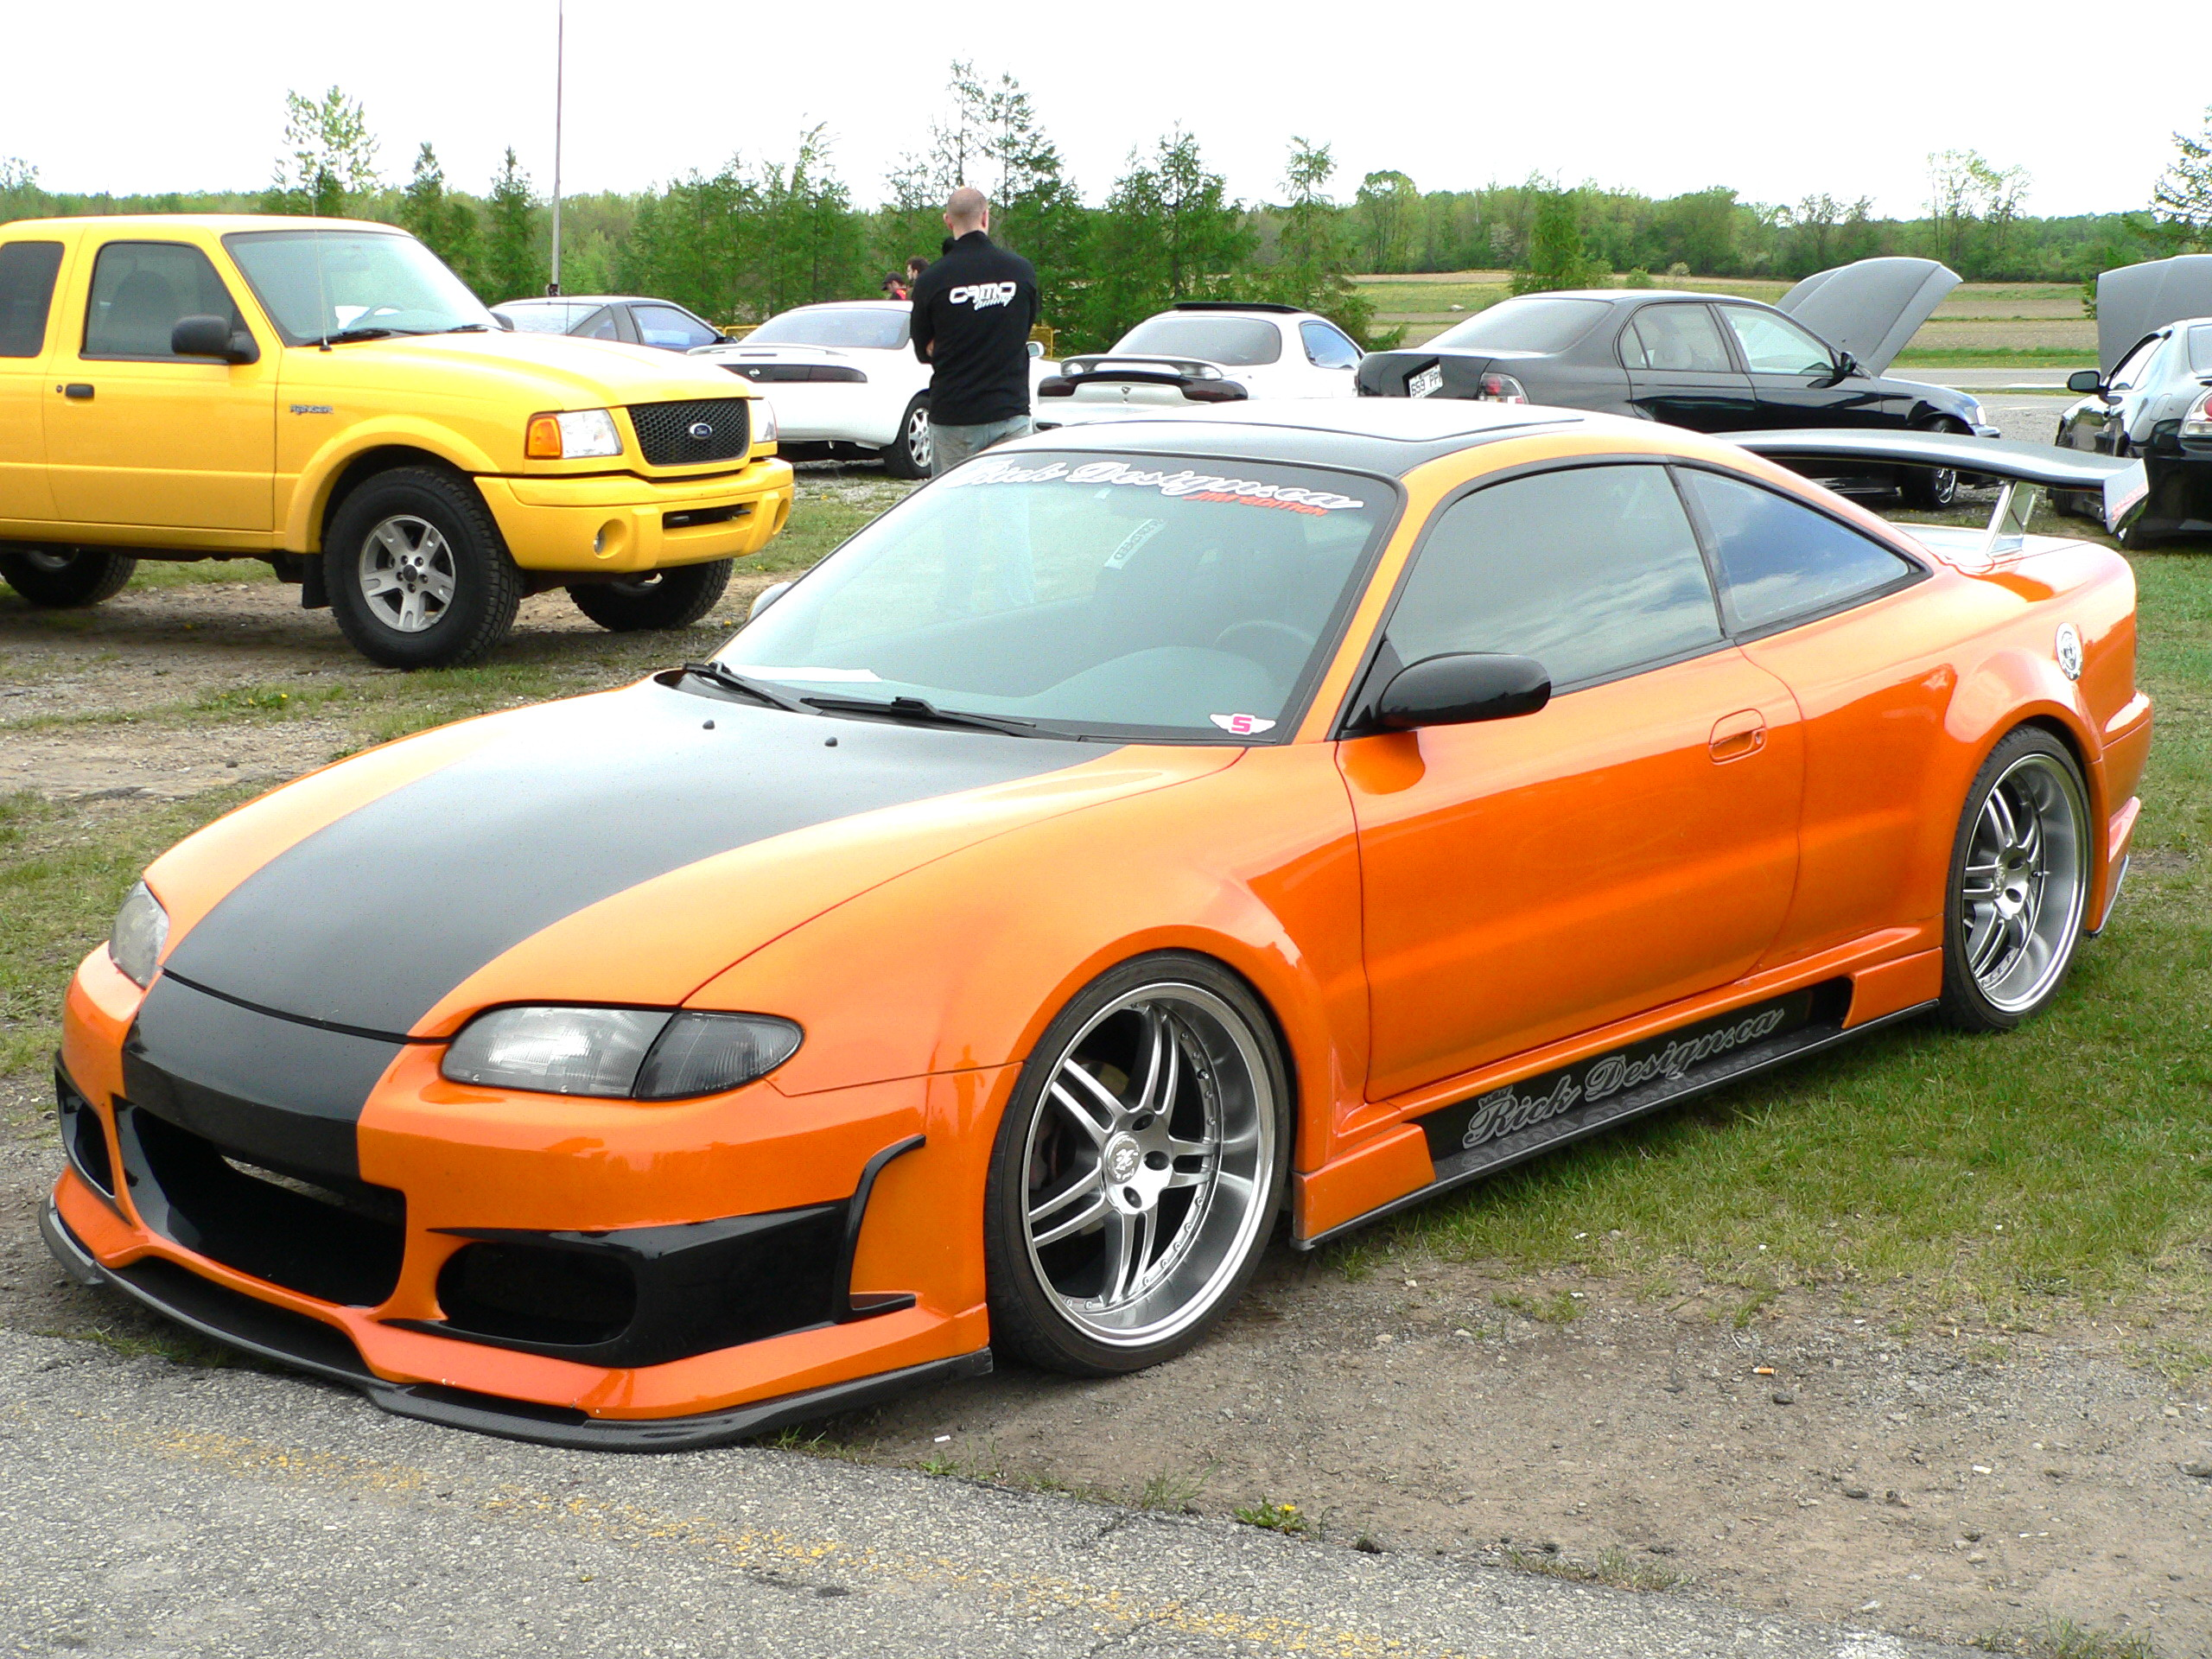 Tuning Cars And News Mazda Mx 6 Custom